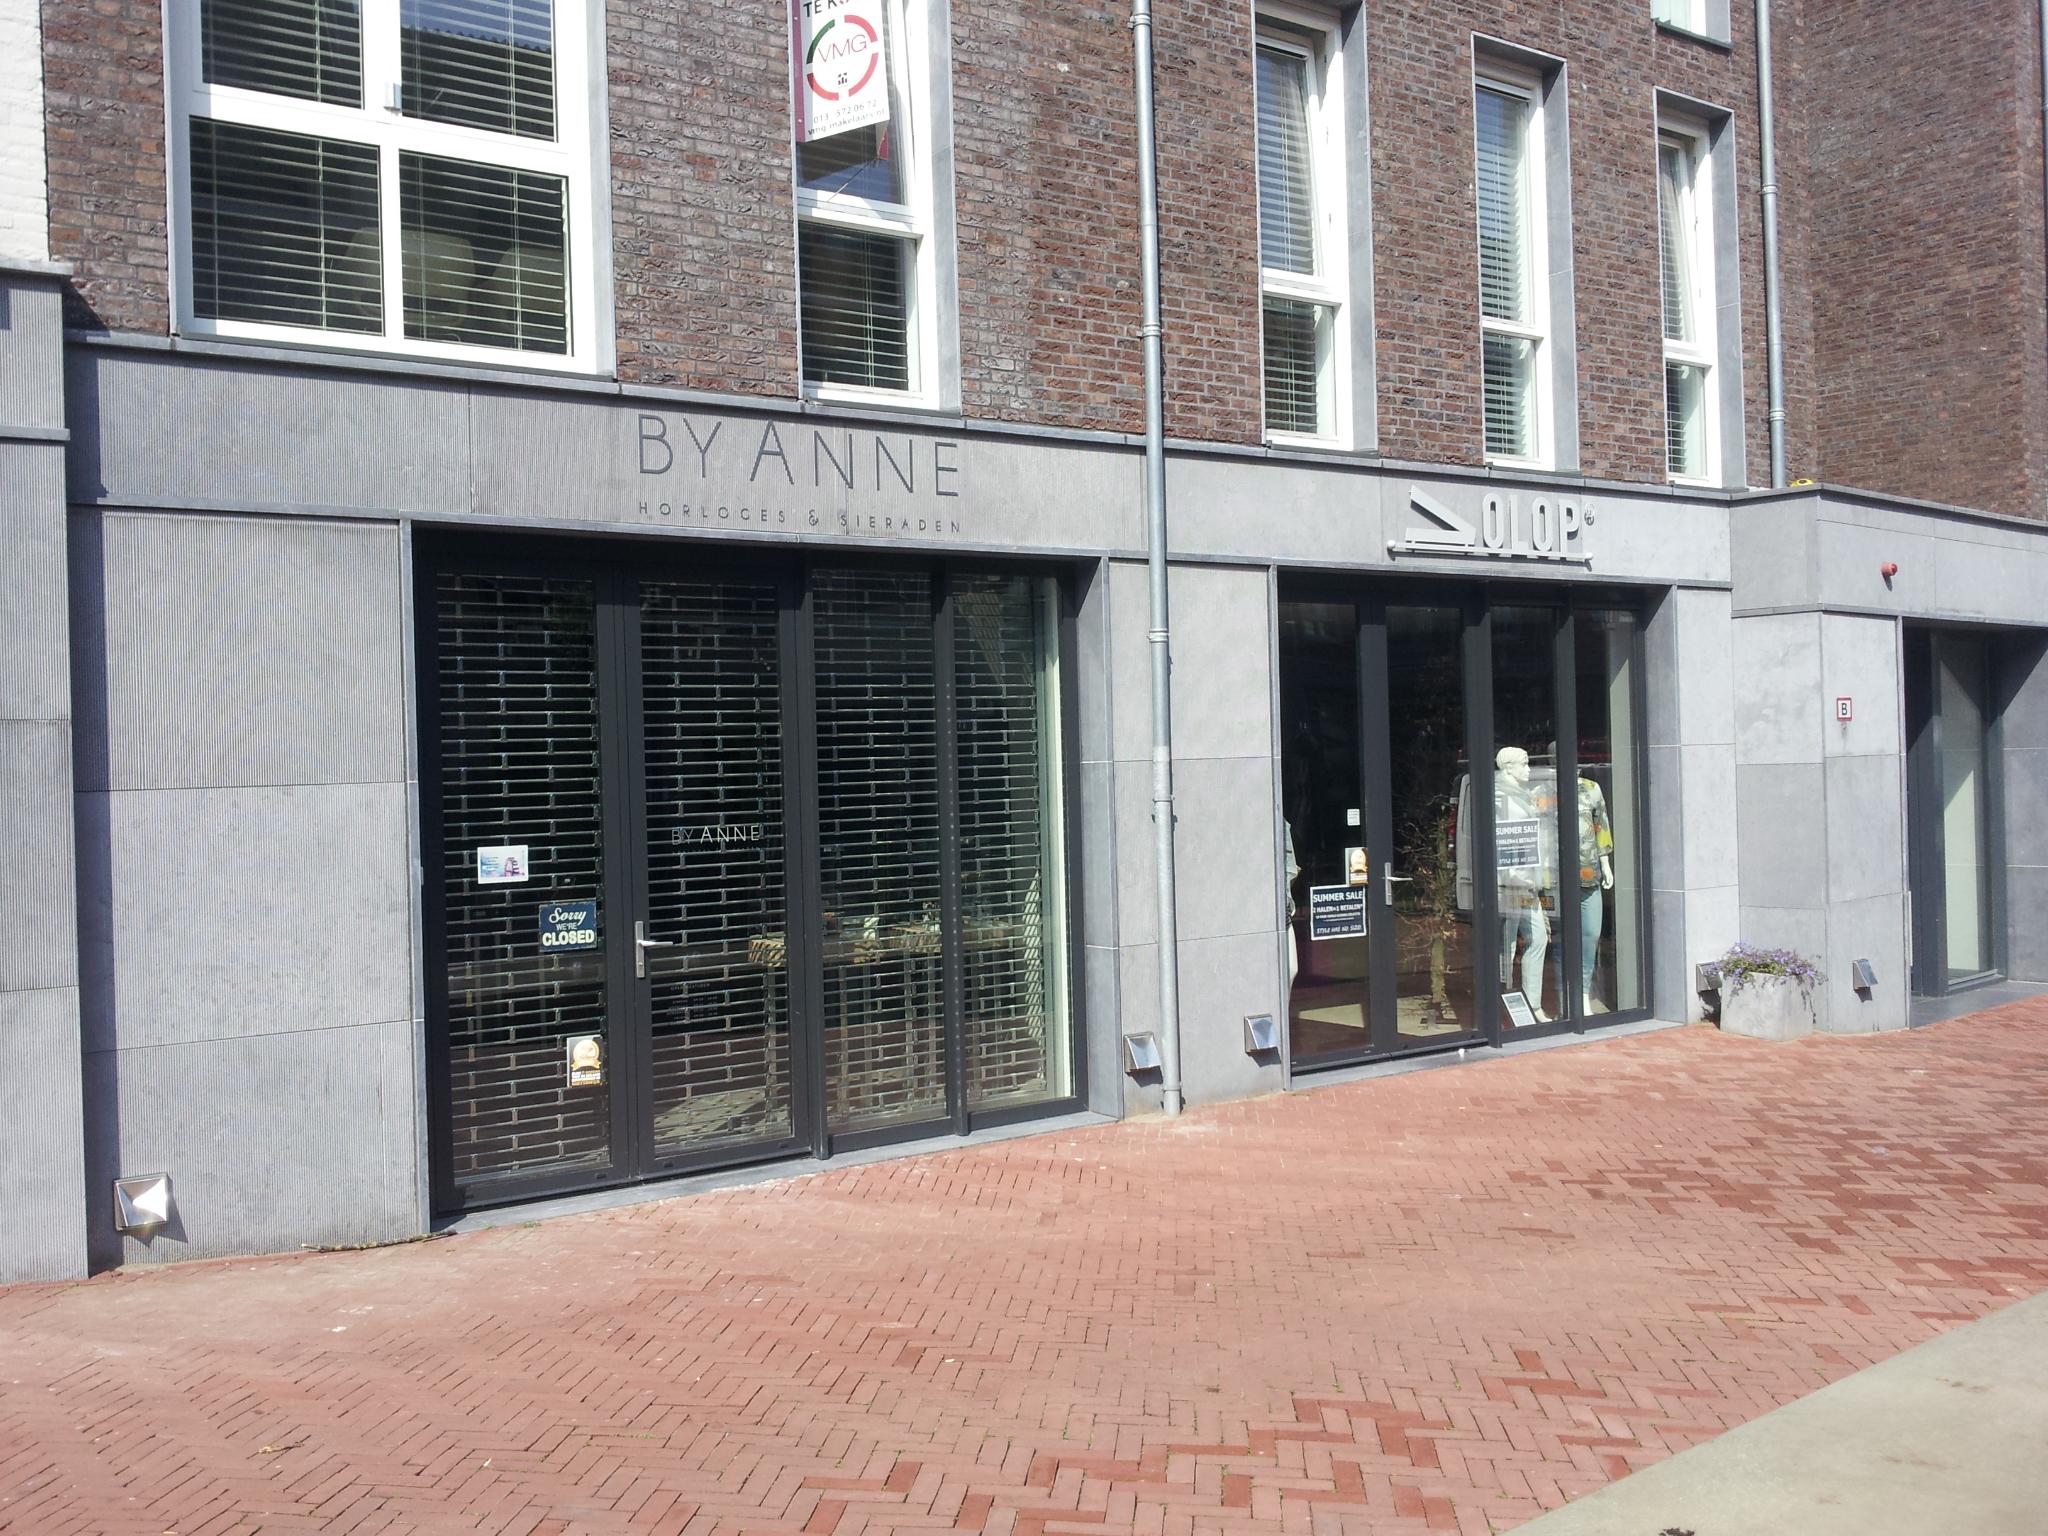 Winkelcentrum Sweanhof